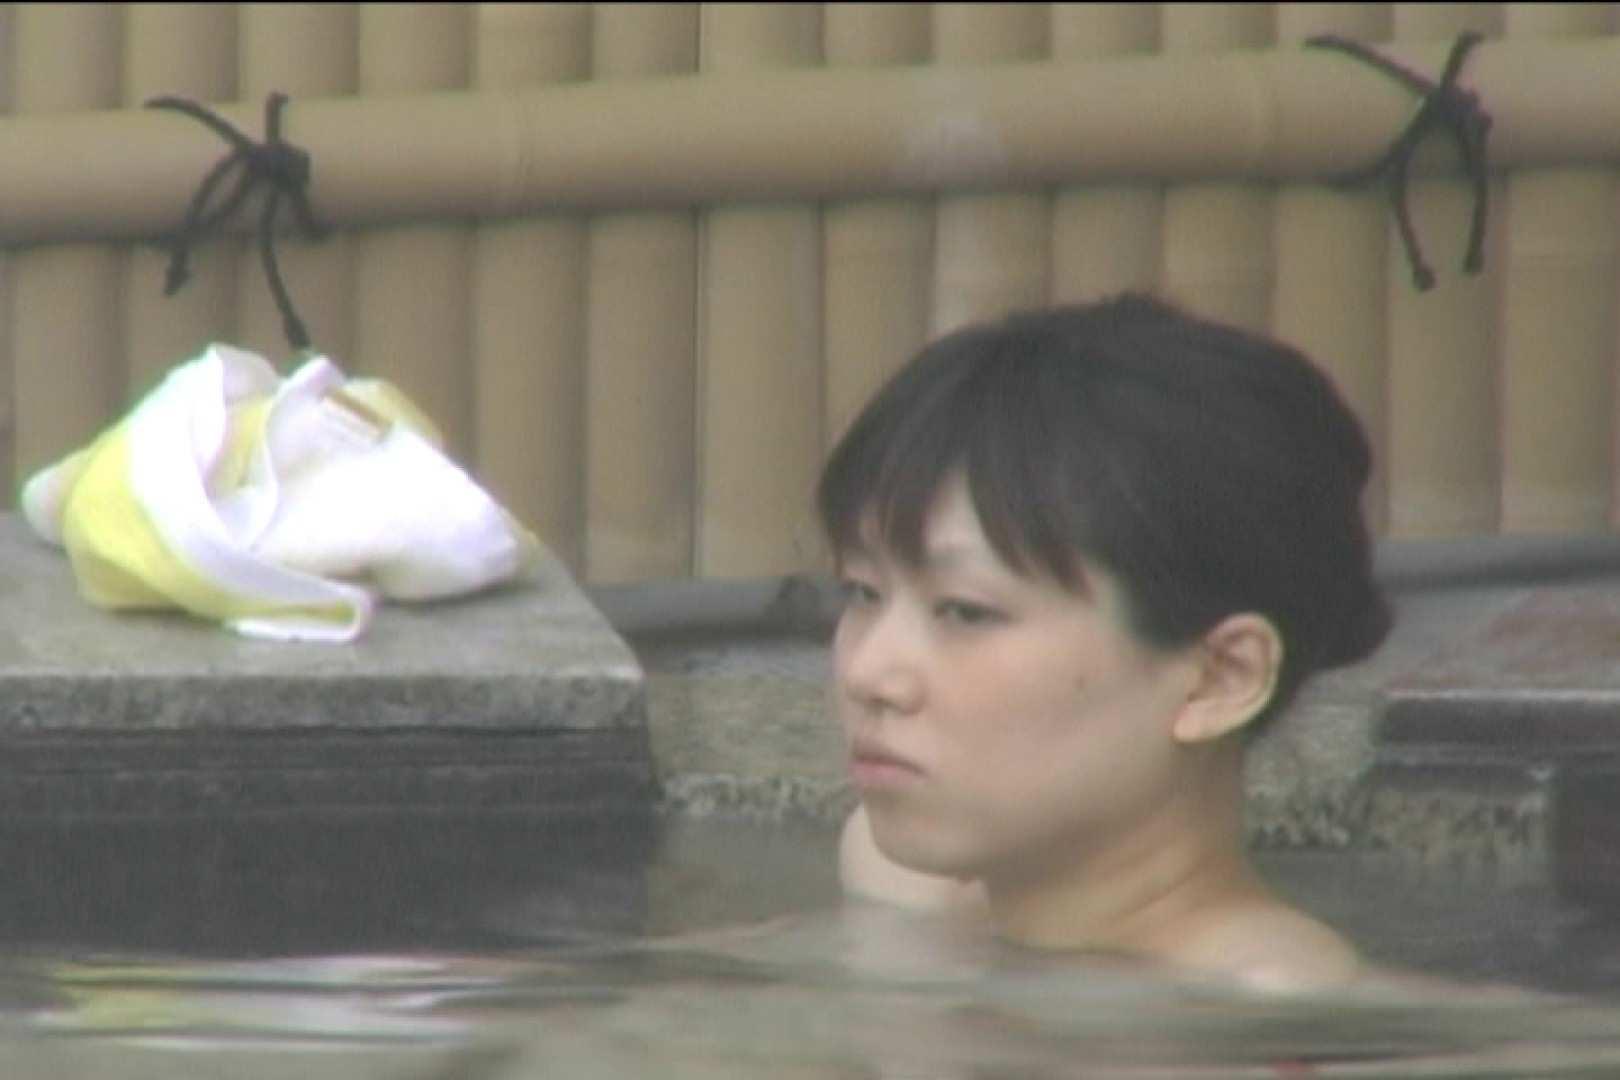 Aquaな露天風呂Vol.121 美しいOLの裸体   露天風呂突入  105pic 34